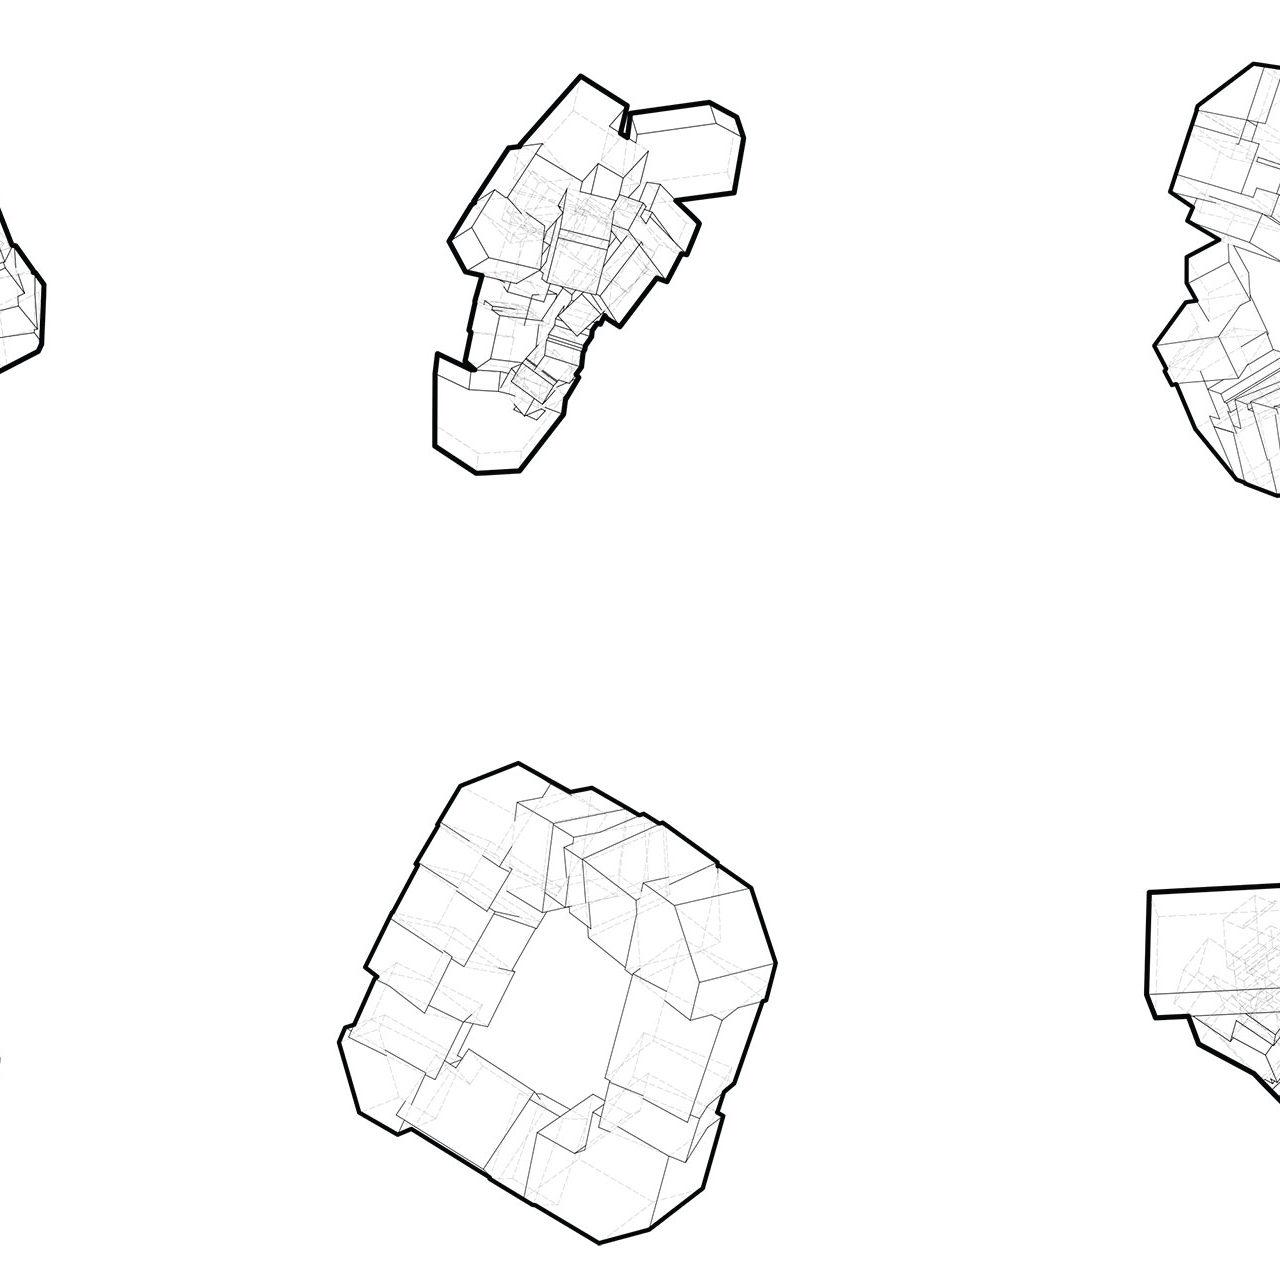 Aggregated Figure: The City as Folded Blocks